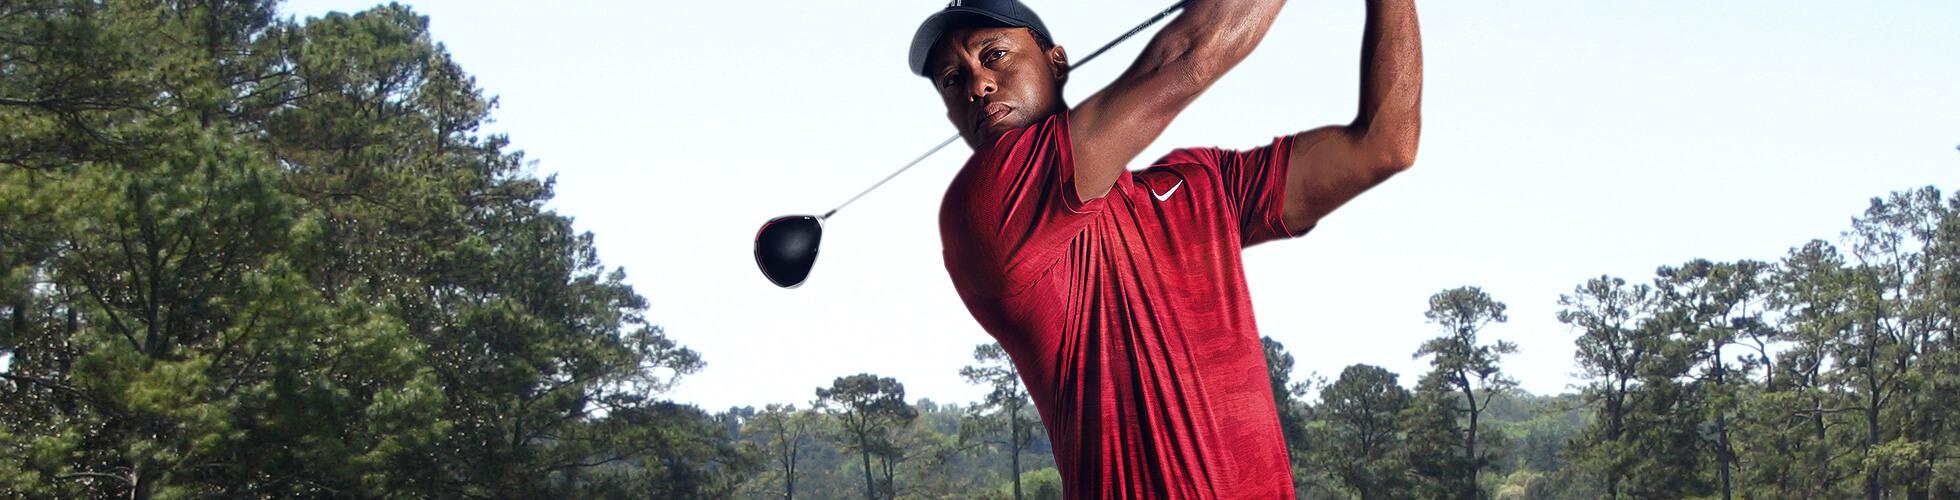 Tiger Woods - 2019 Masters Champion